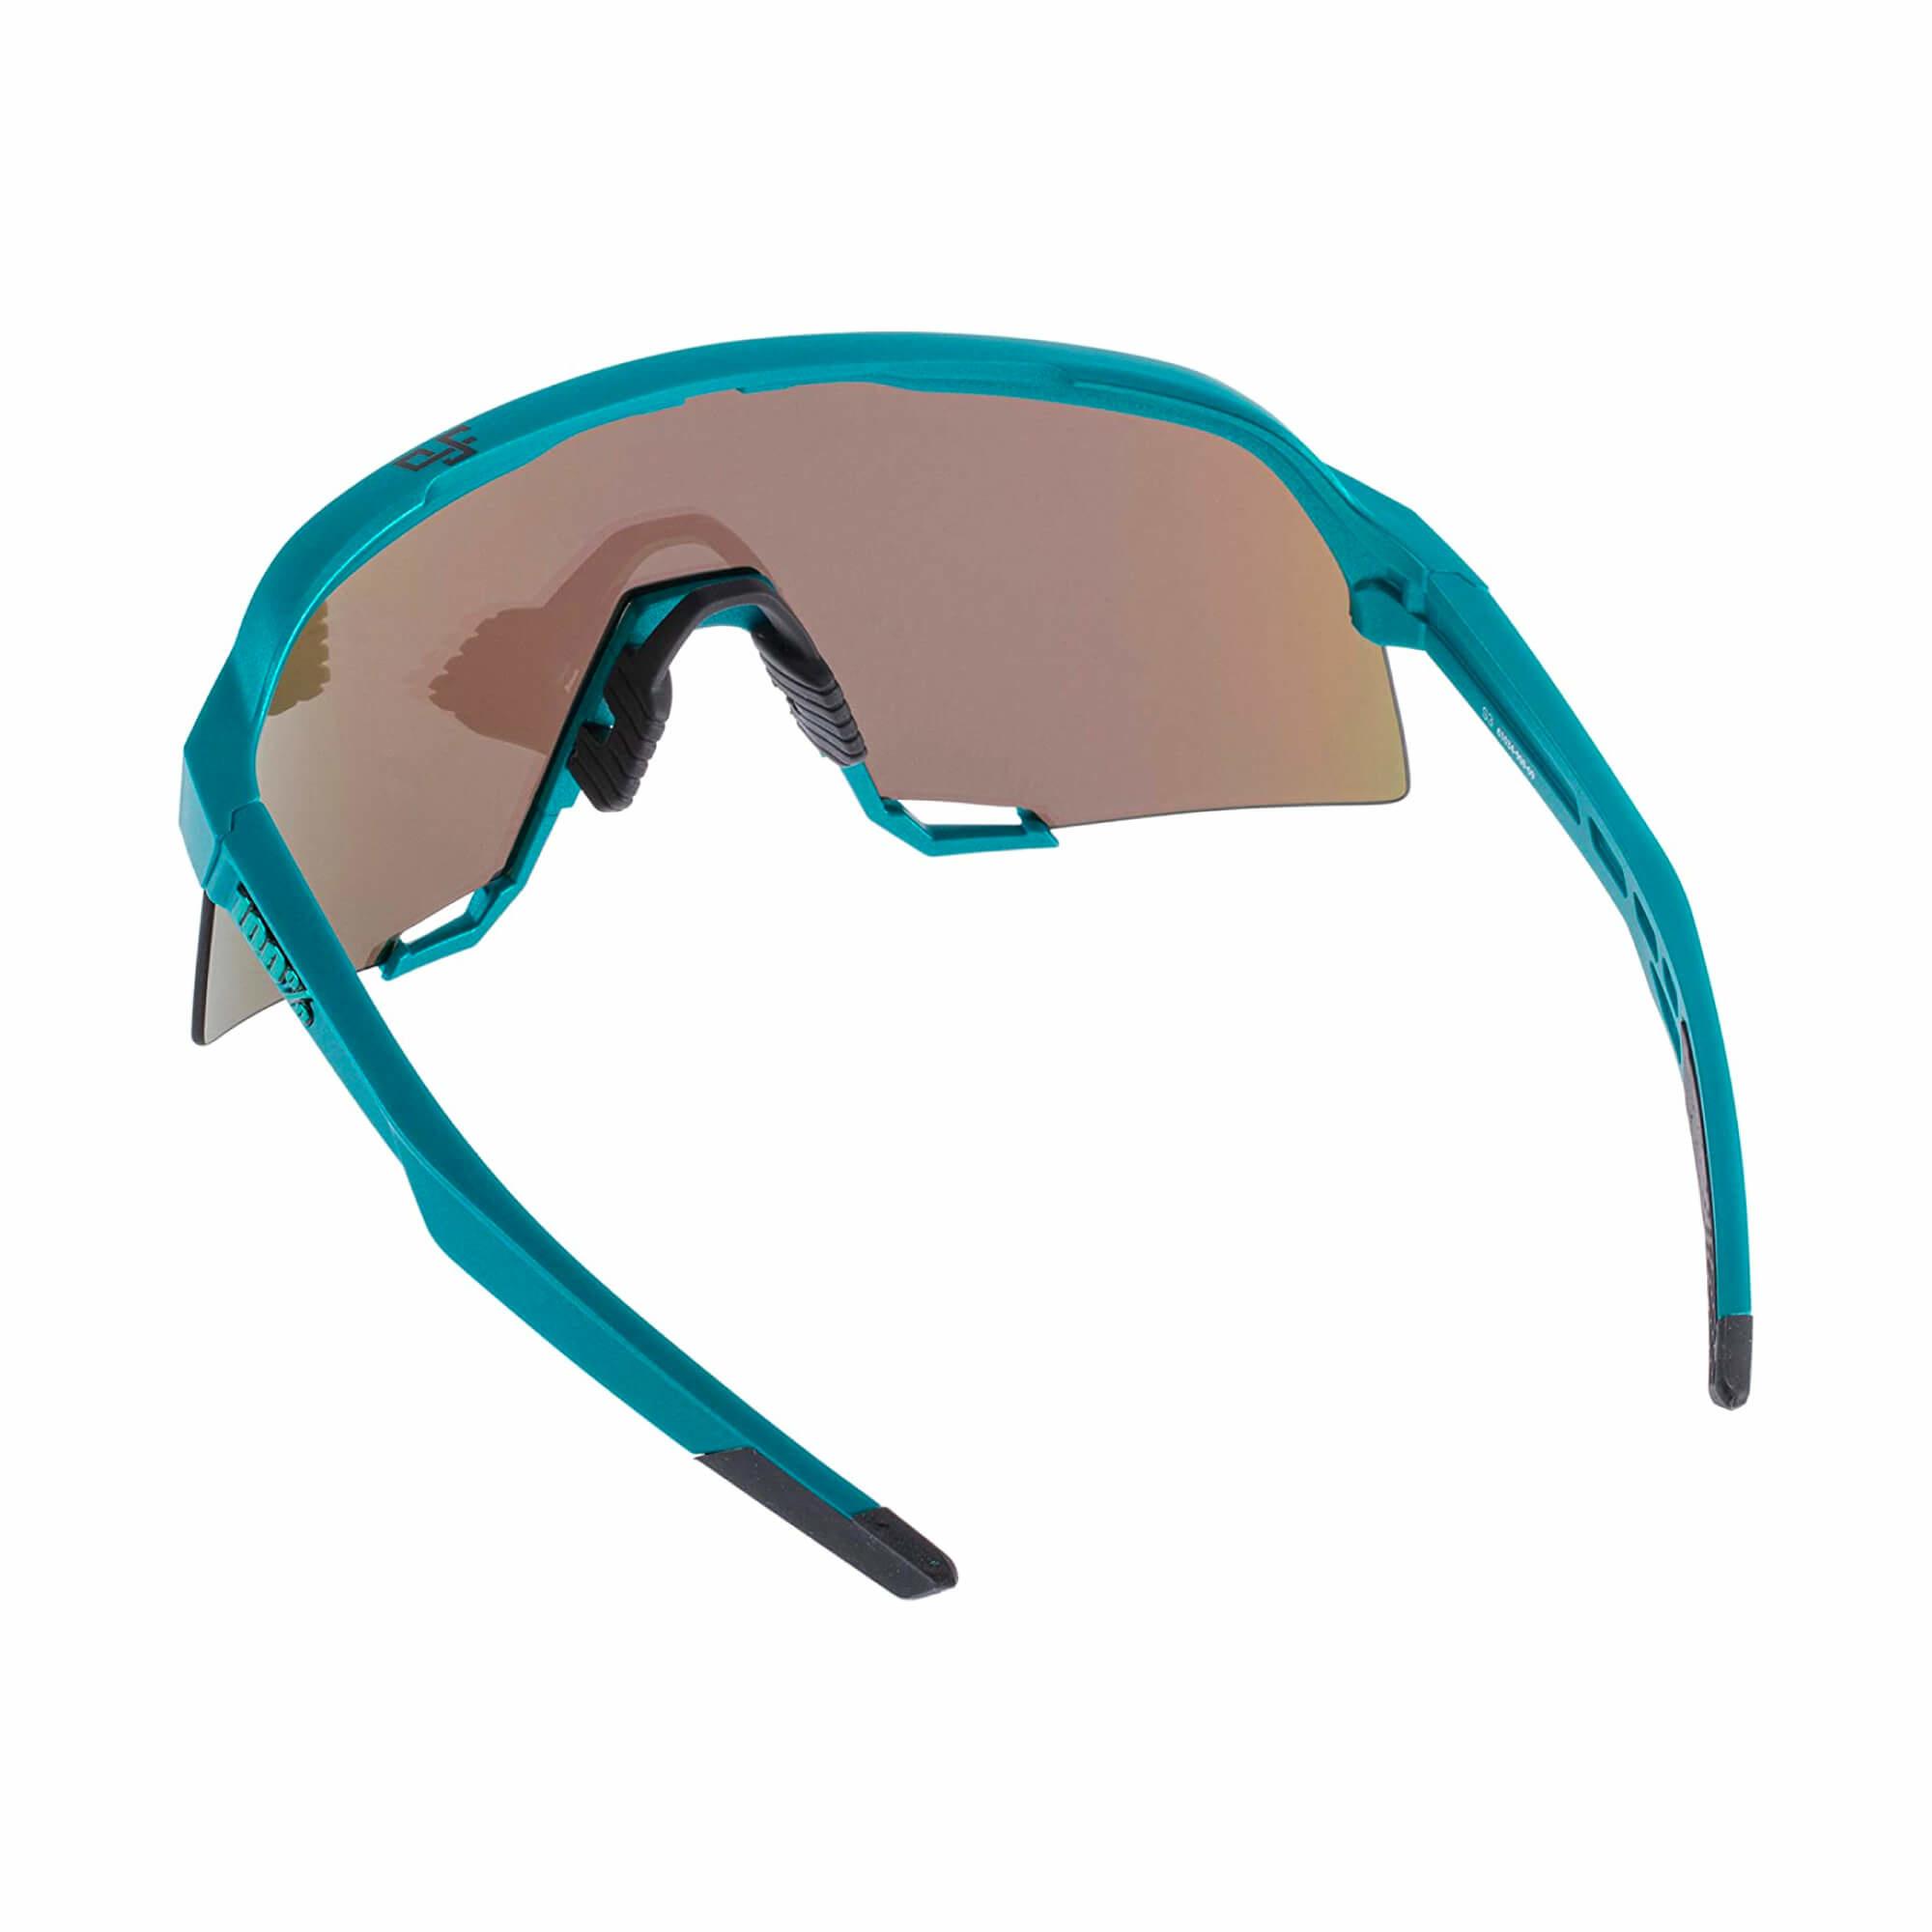 S3 Peter Sagan Limited Edition Blue Topaz Multilayer Mirror Lens-2